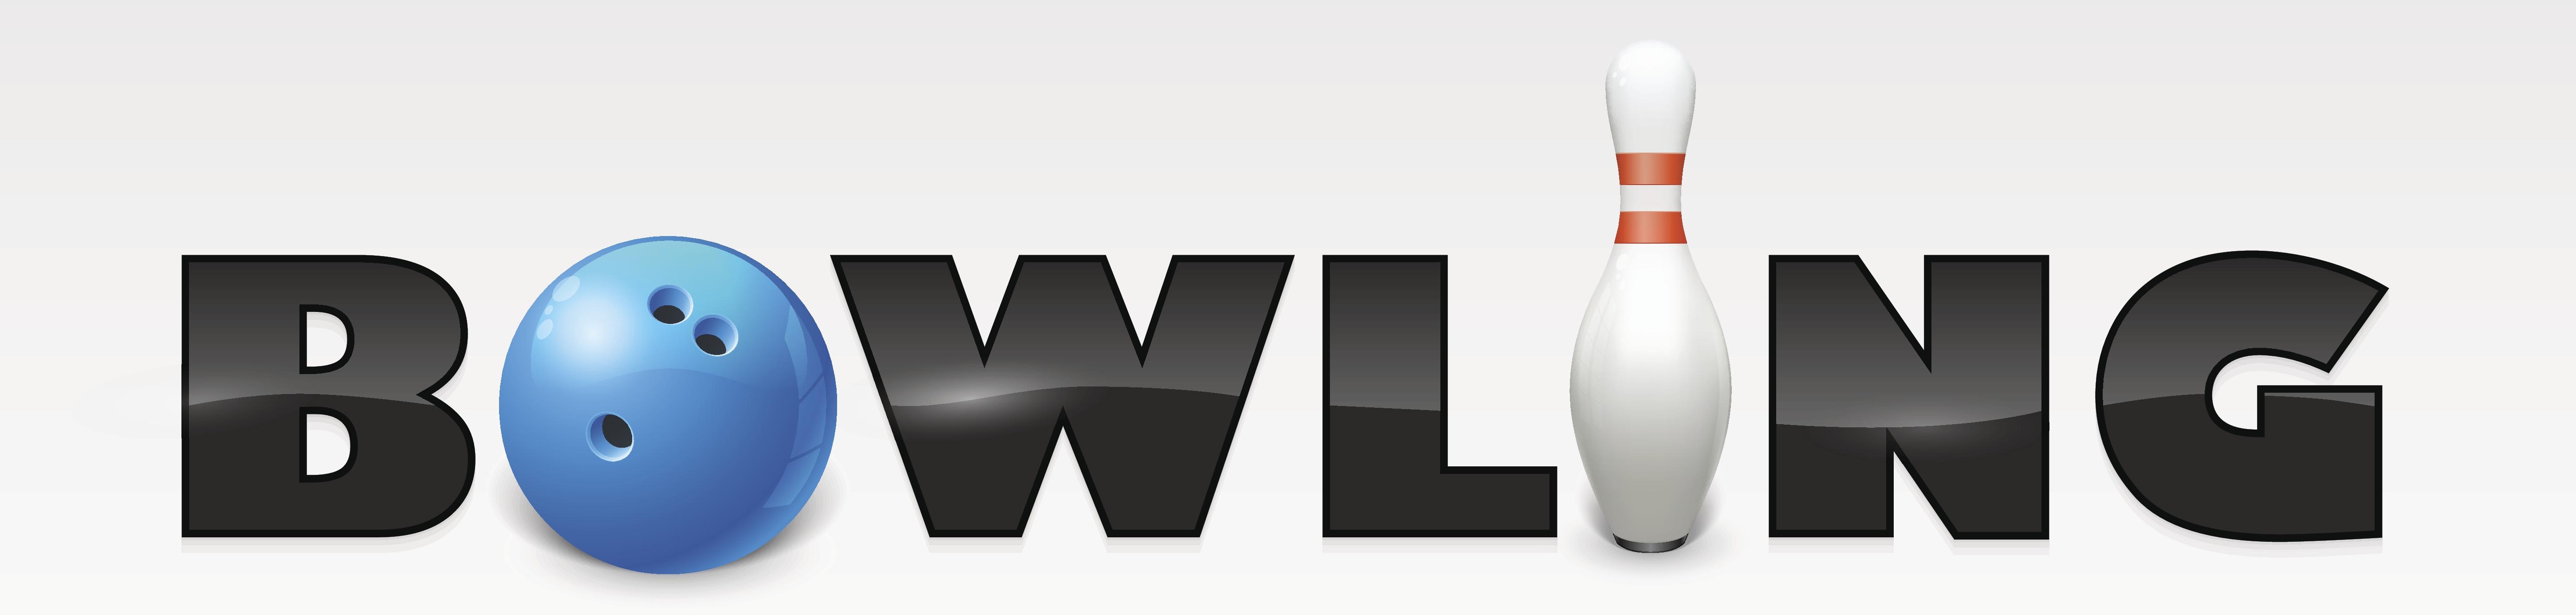 bowling-banner.jpg